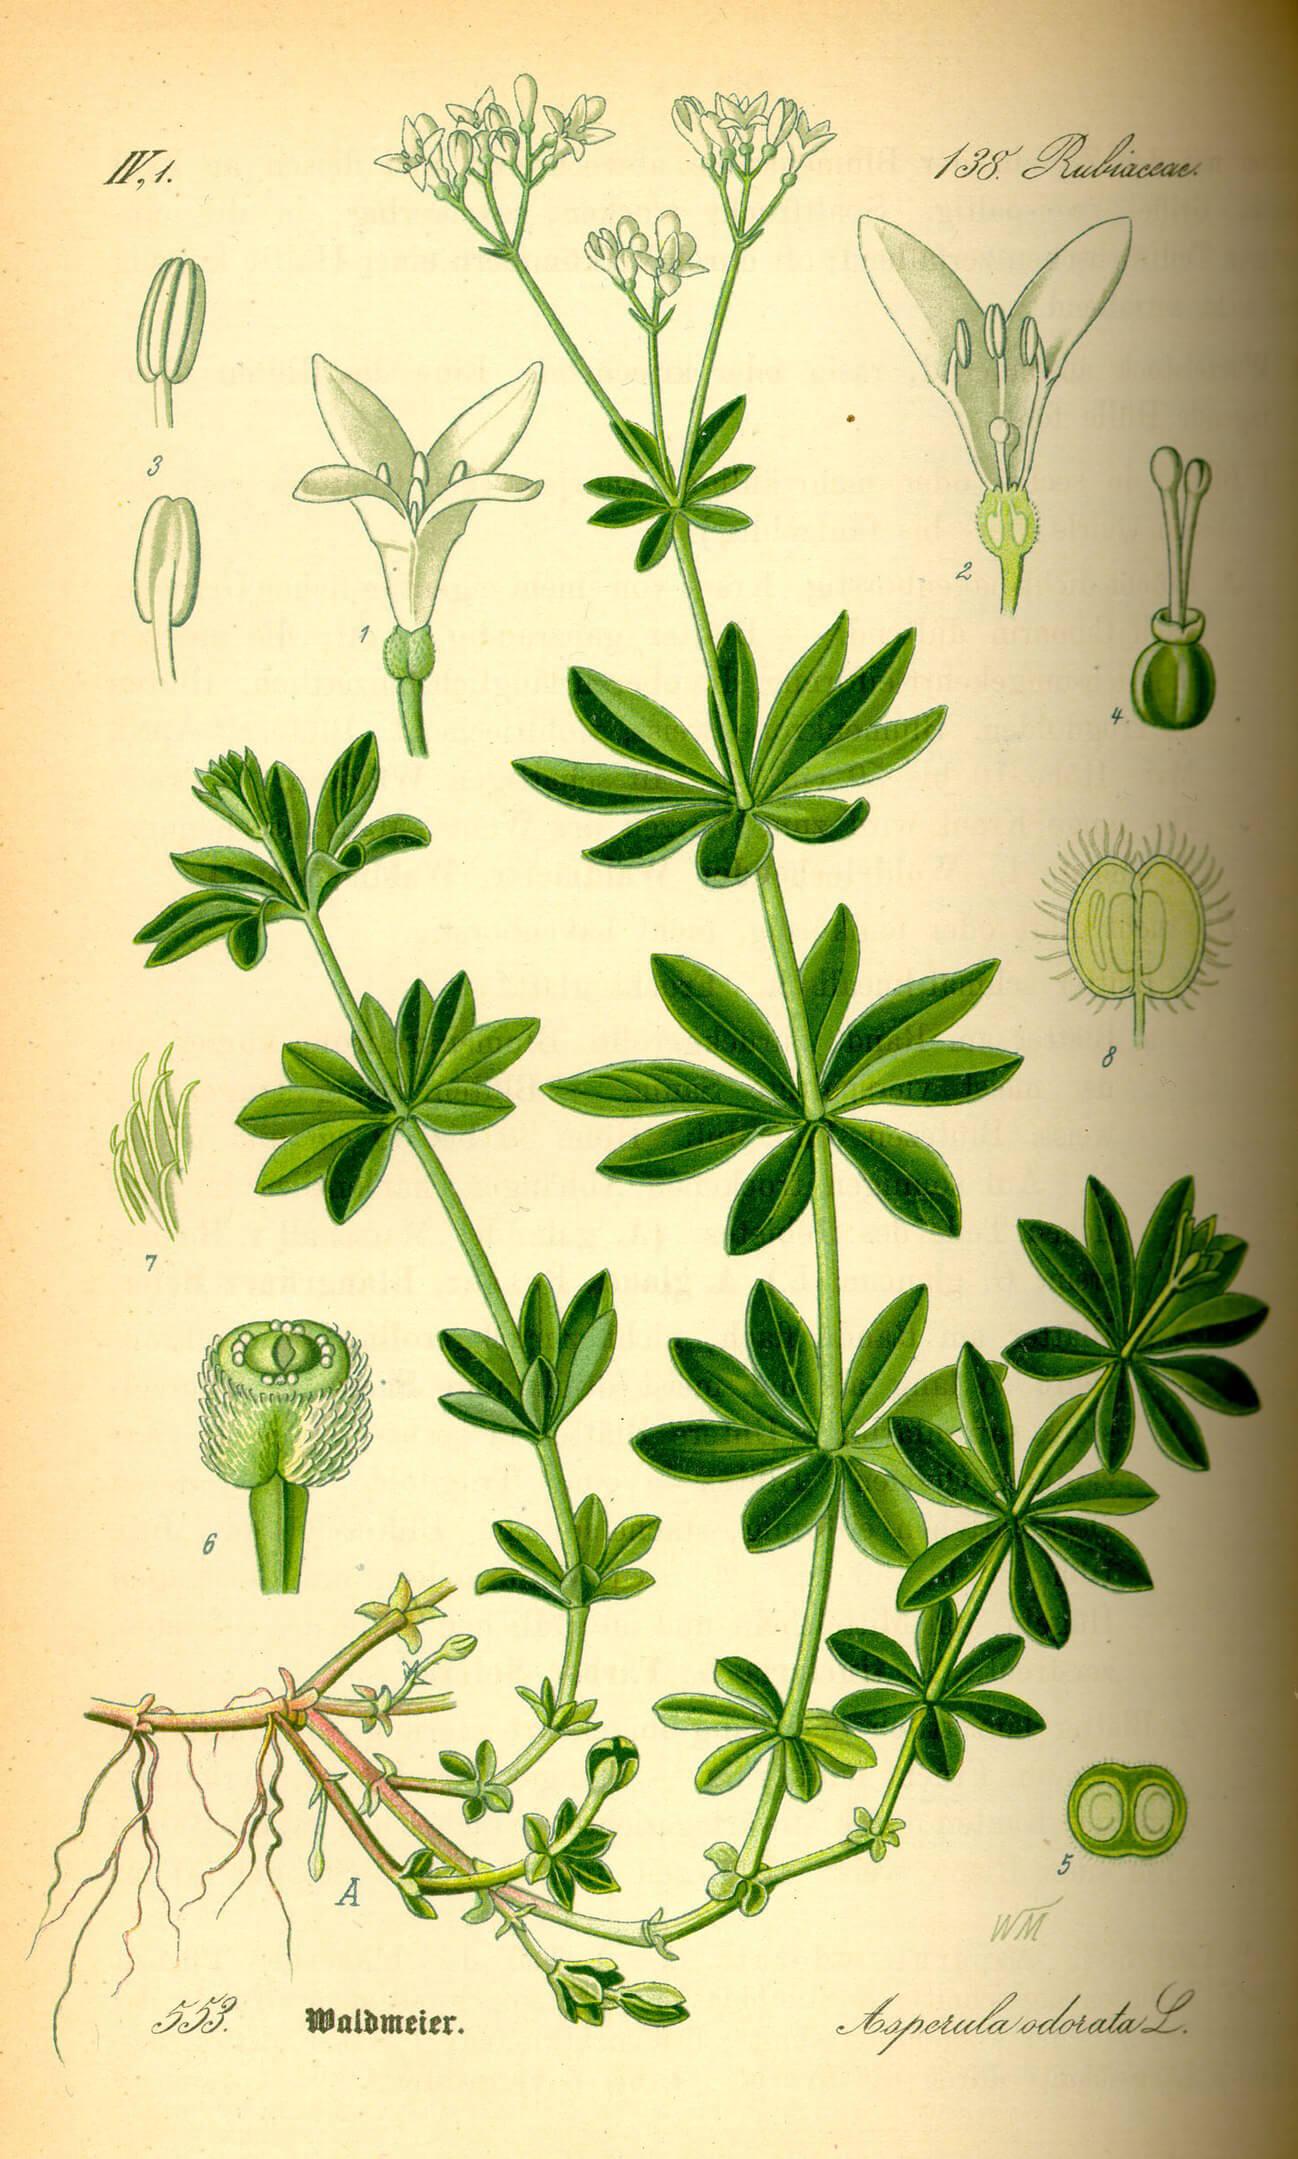 Waldmeister-Galium-odoratum-Illustration